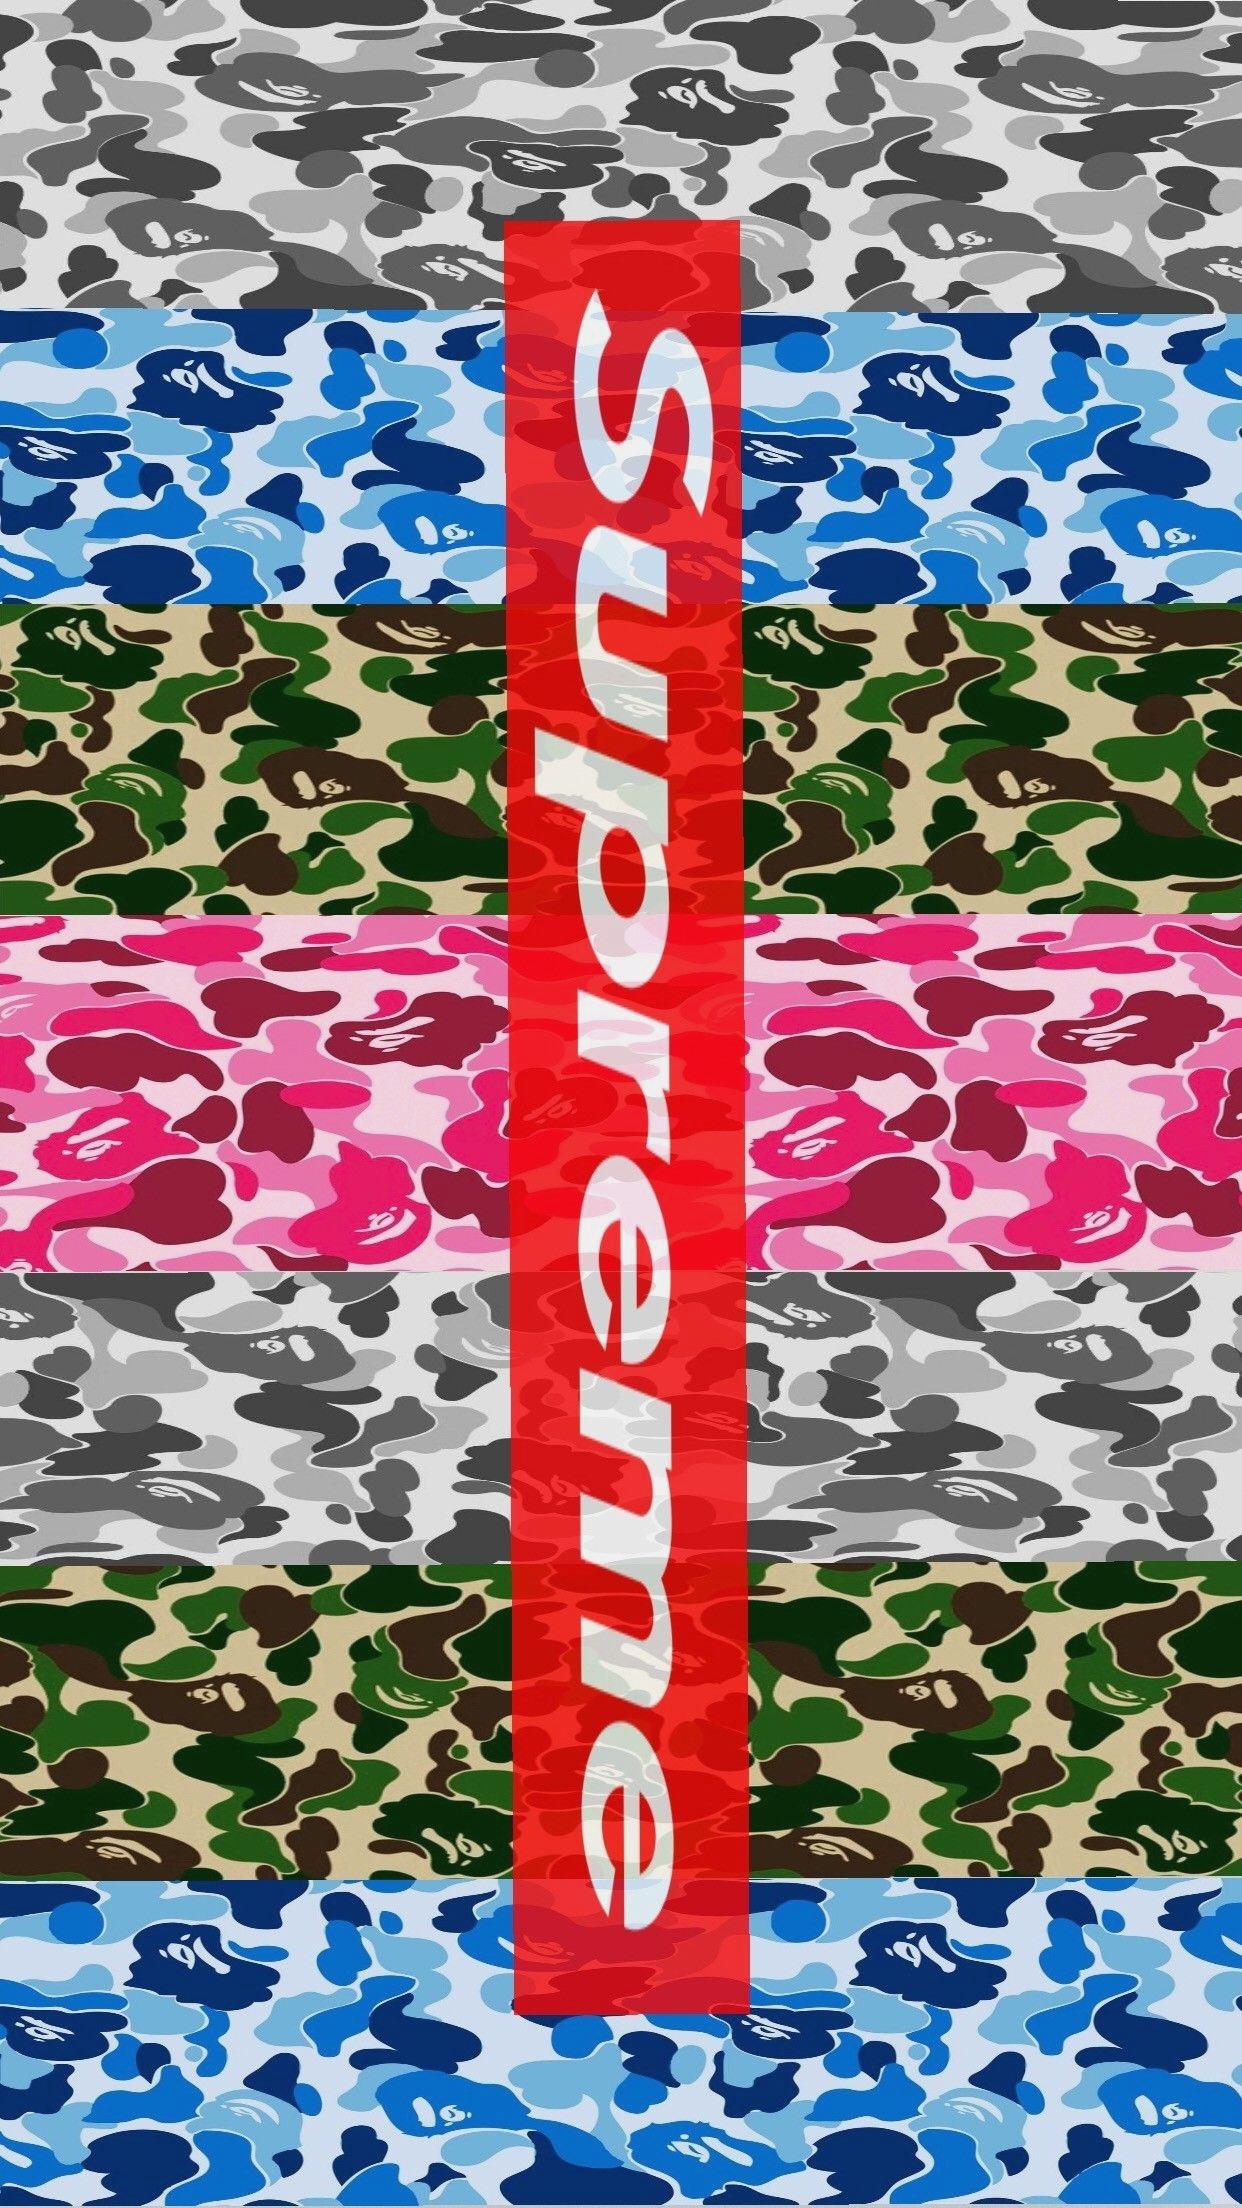 Cartoon Supreme Bape Gucci Wallpaper | Brengsek Wall